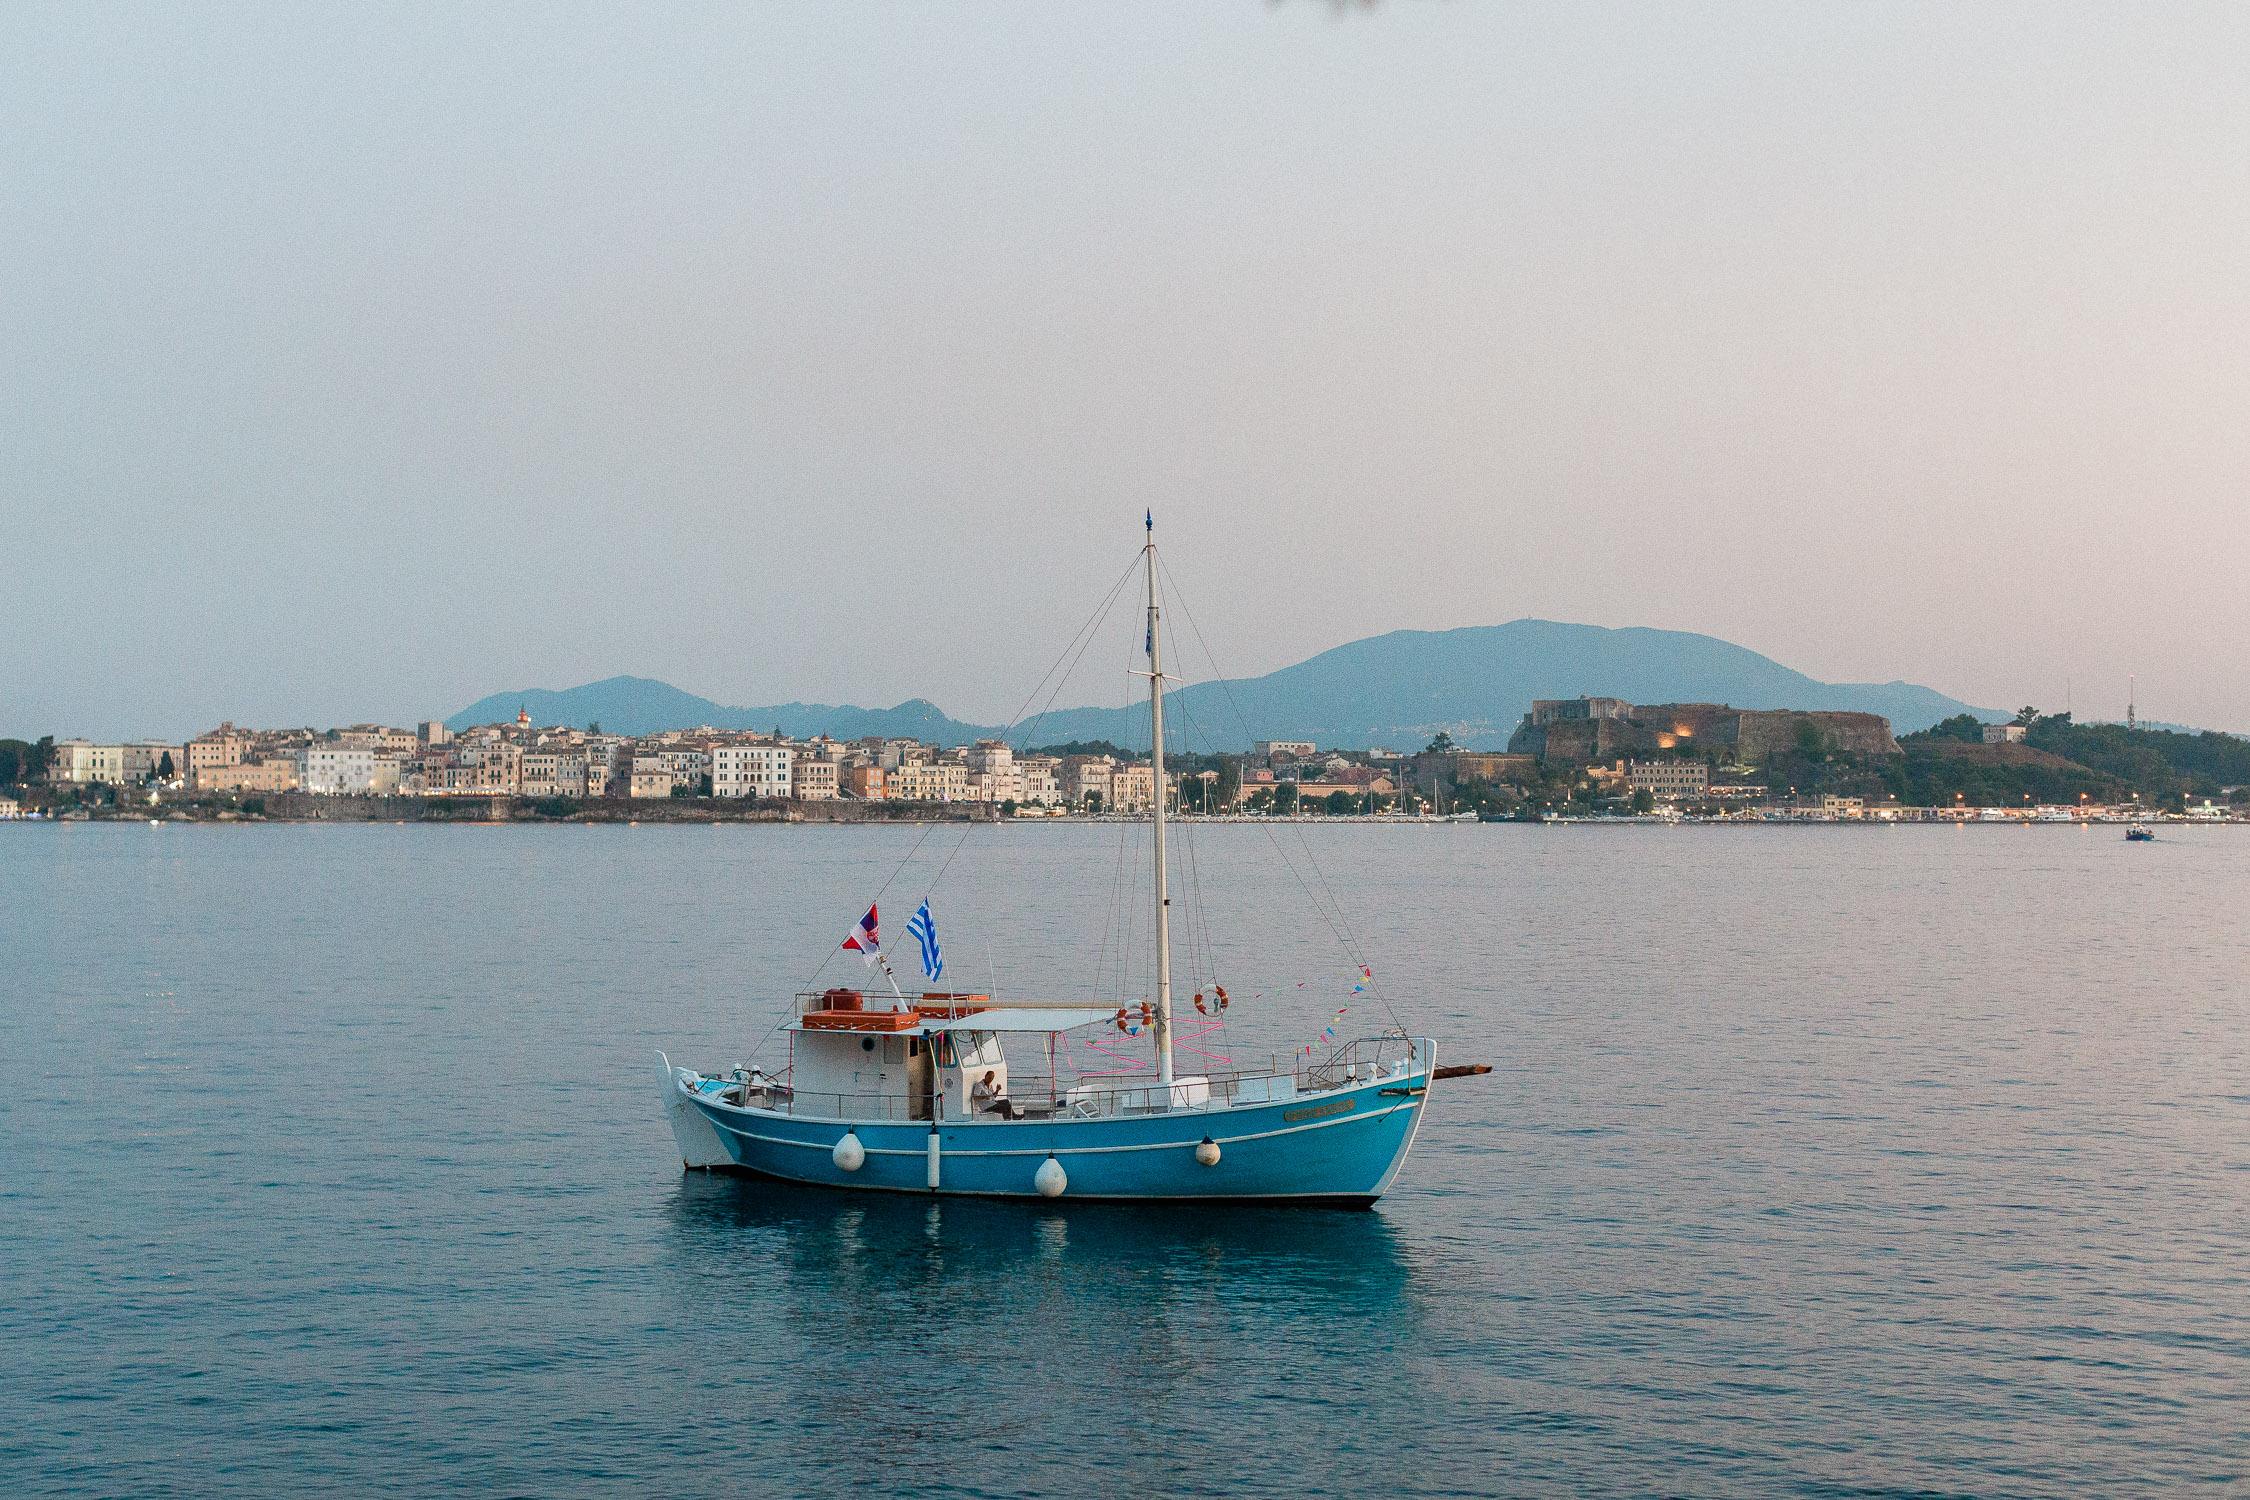 bespoke view of Corfu island while sun goes down